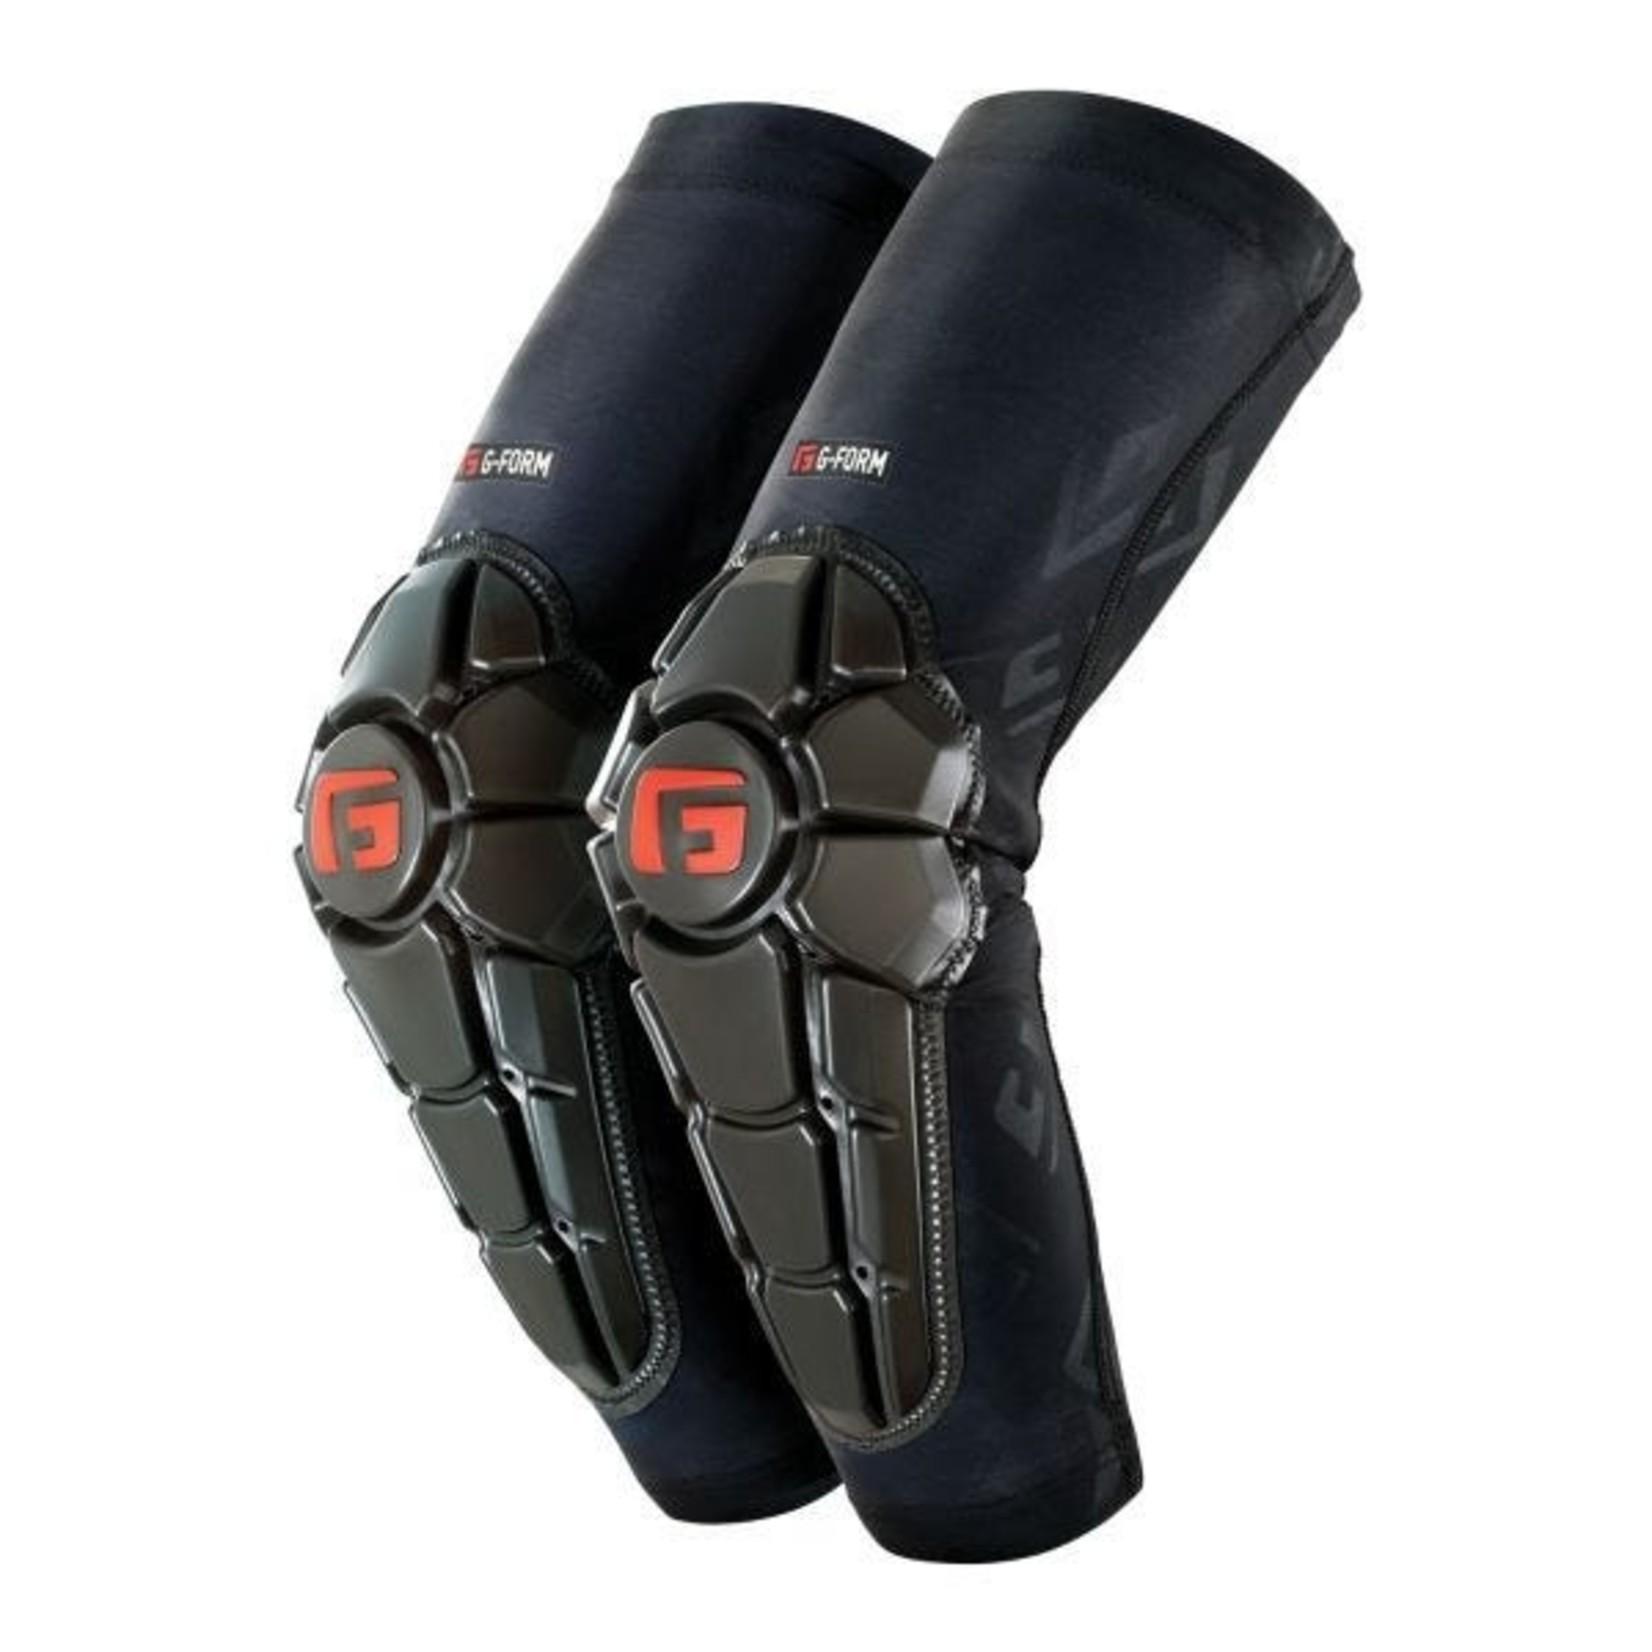 G-Form G-Form, Pro-X2, Elbow/Forearm Guard, Black, M, Set